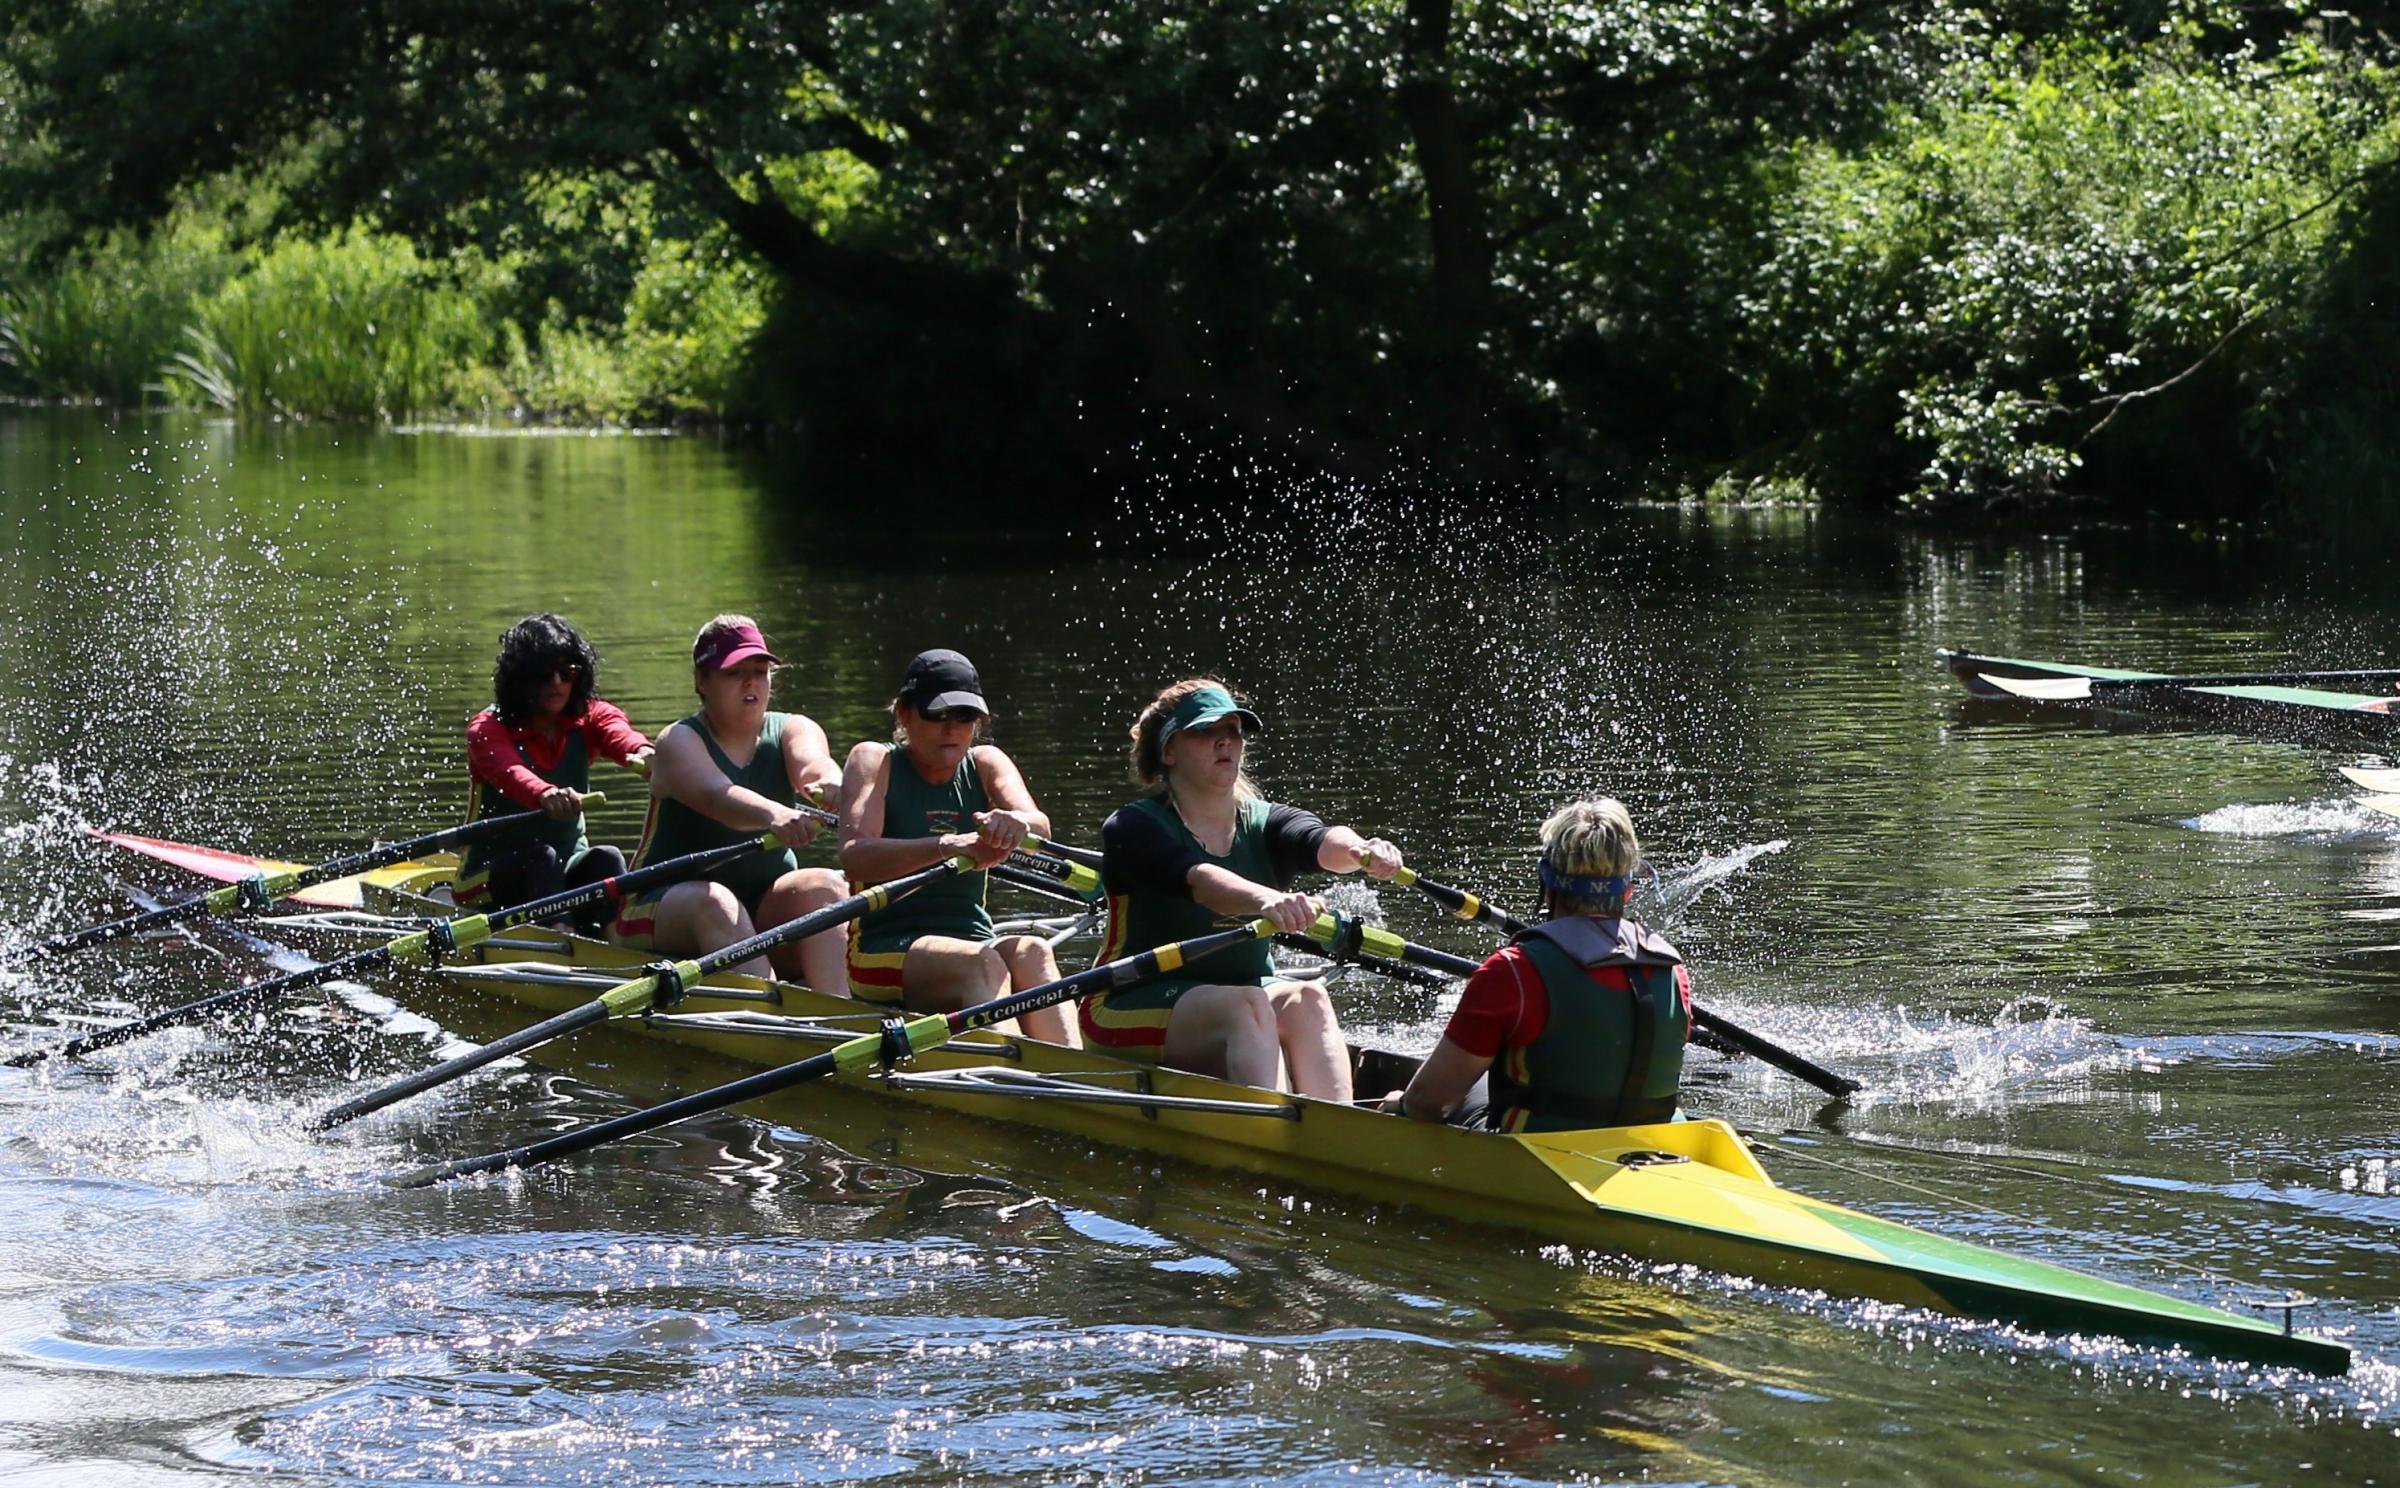 Amateur rowing club